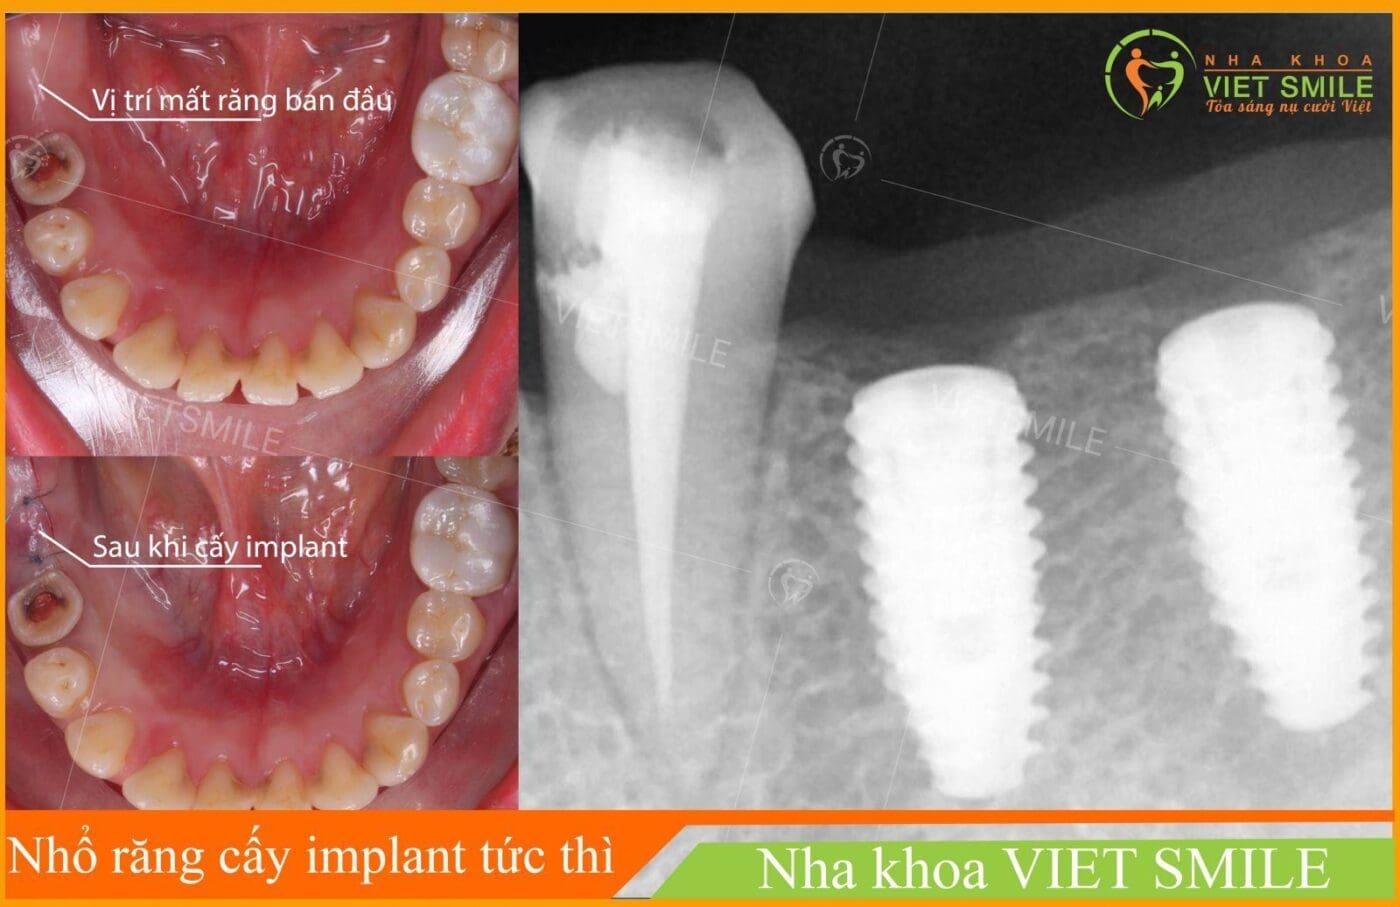 Cay ghep implant tuc thi